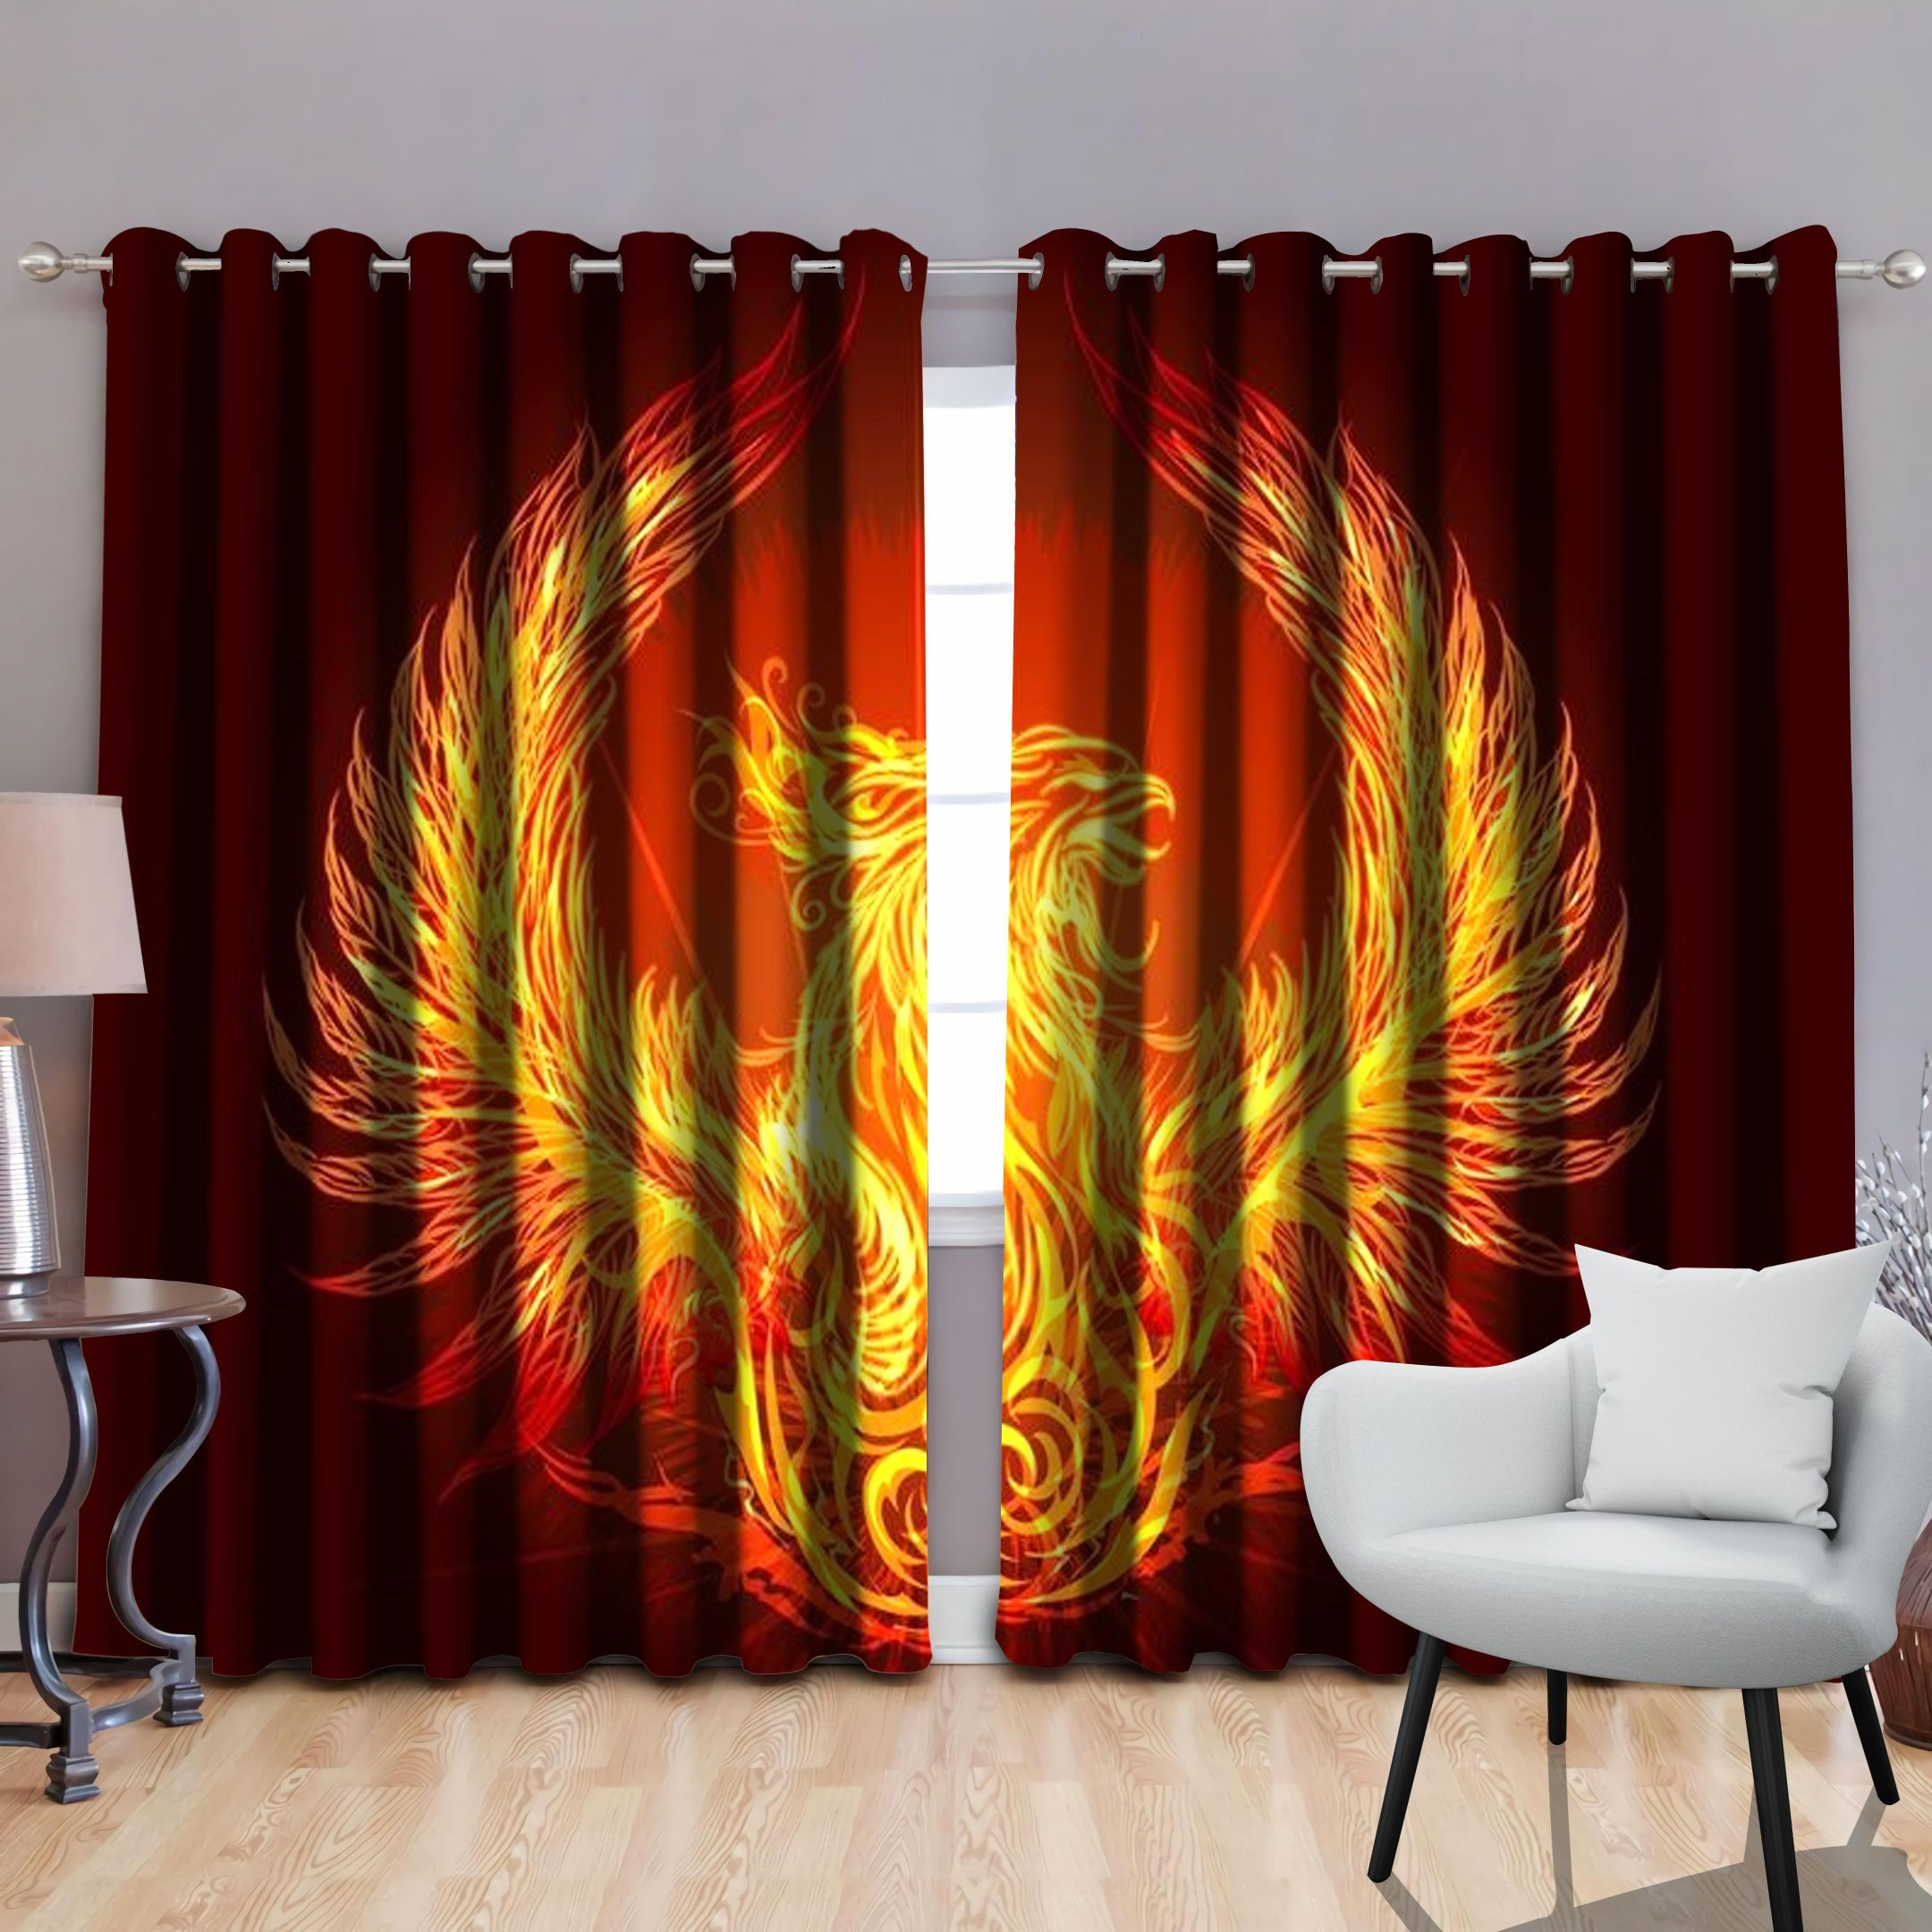 Phoenix Power by SUN Window Curtains JJ180521S-SU